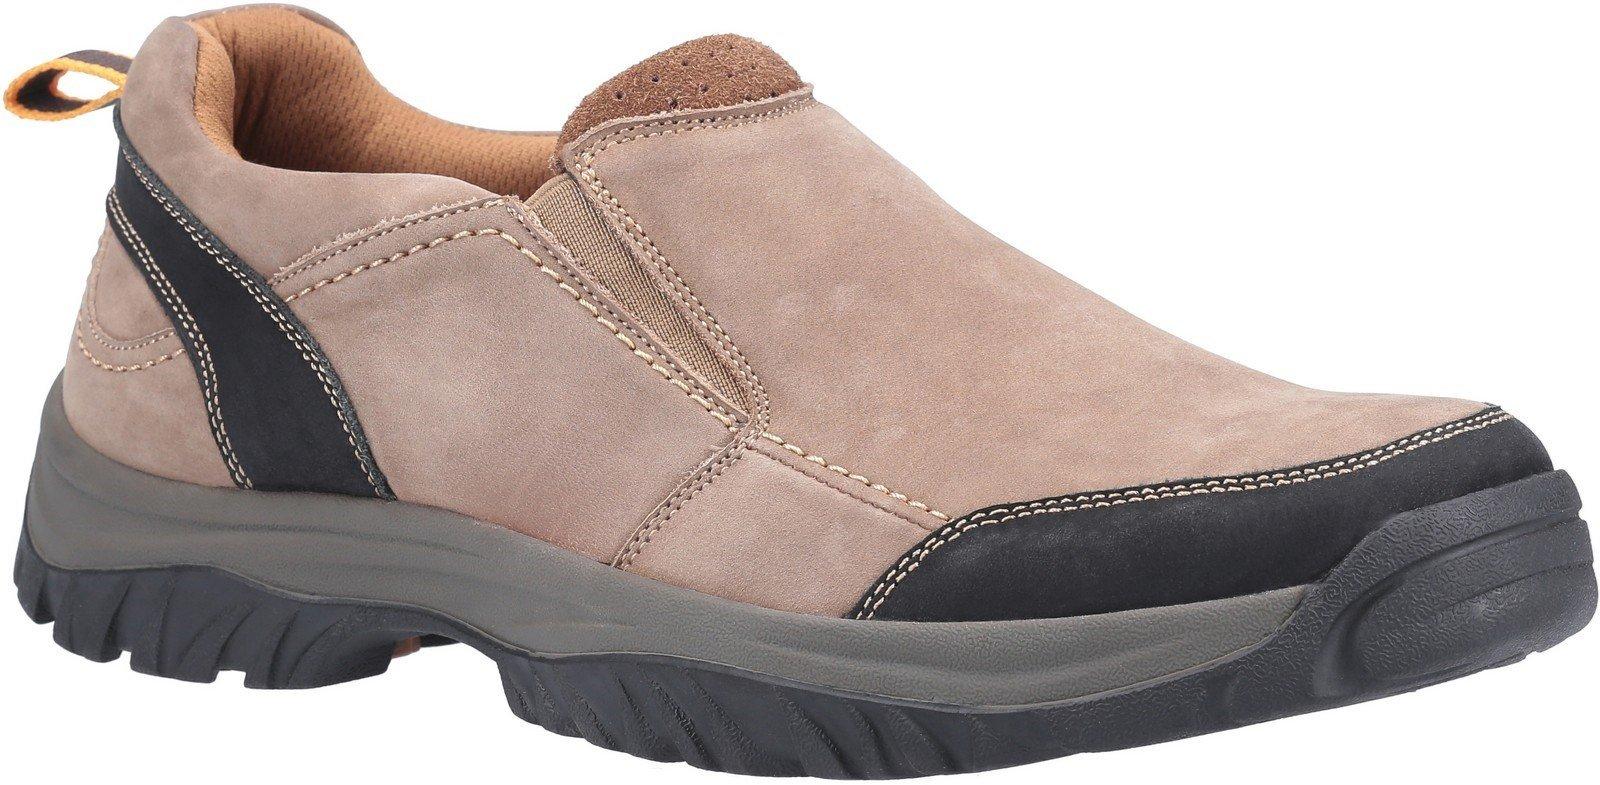 Cotswold Men's Boxwell Slip On Hiking Shoe Various Colours 30149 - Tan 7